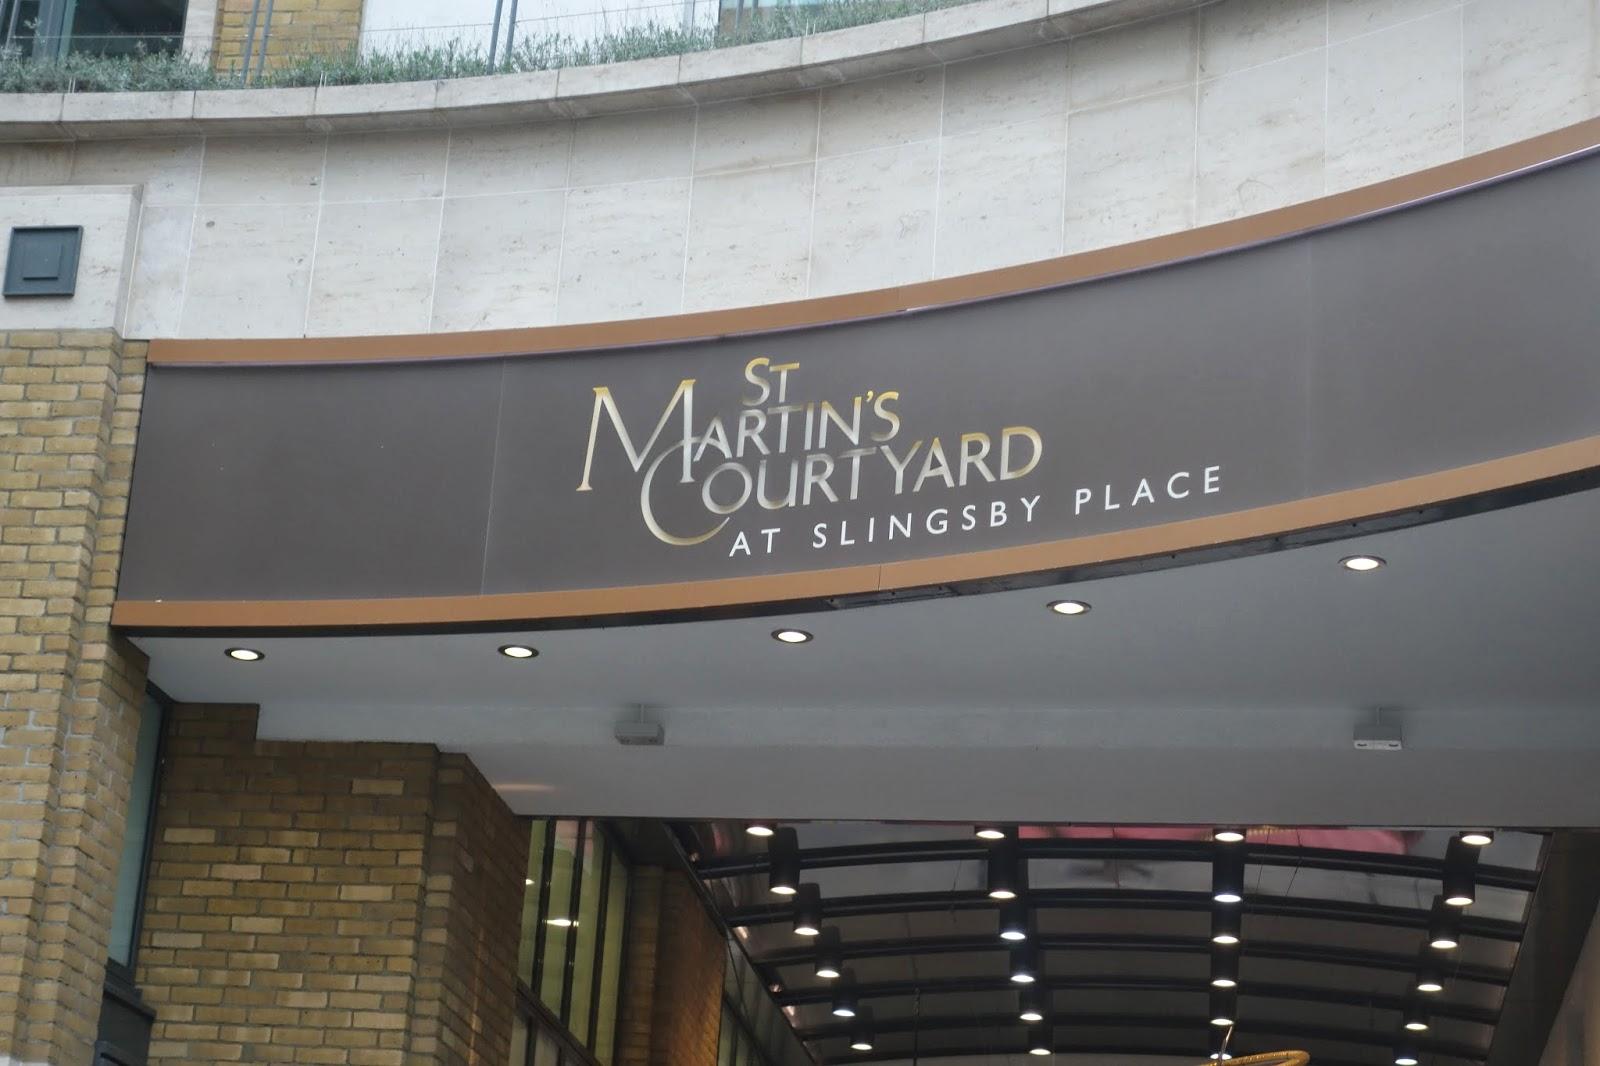 St Martin's Courtyard